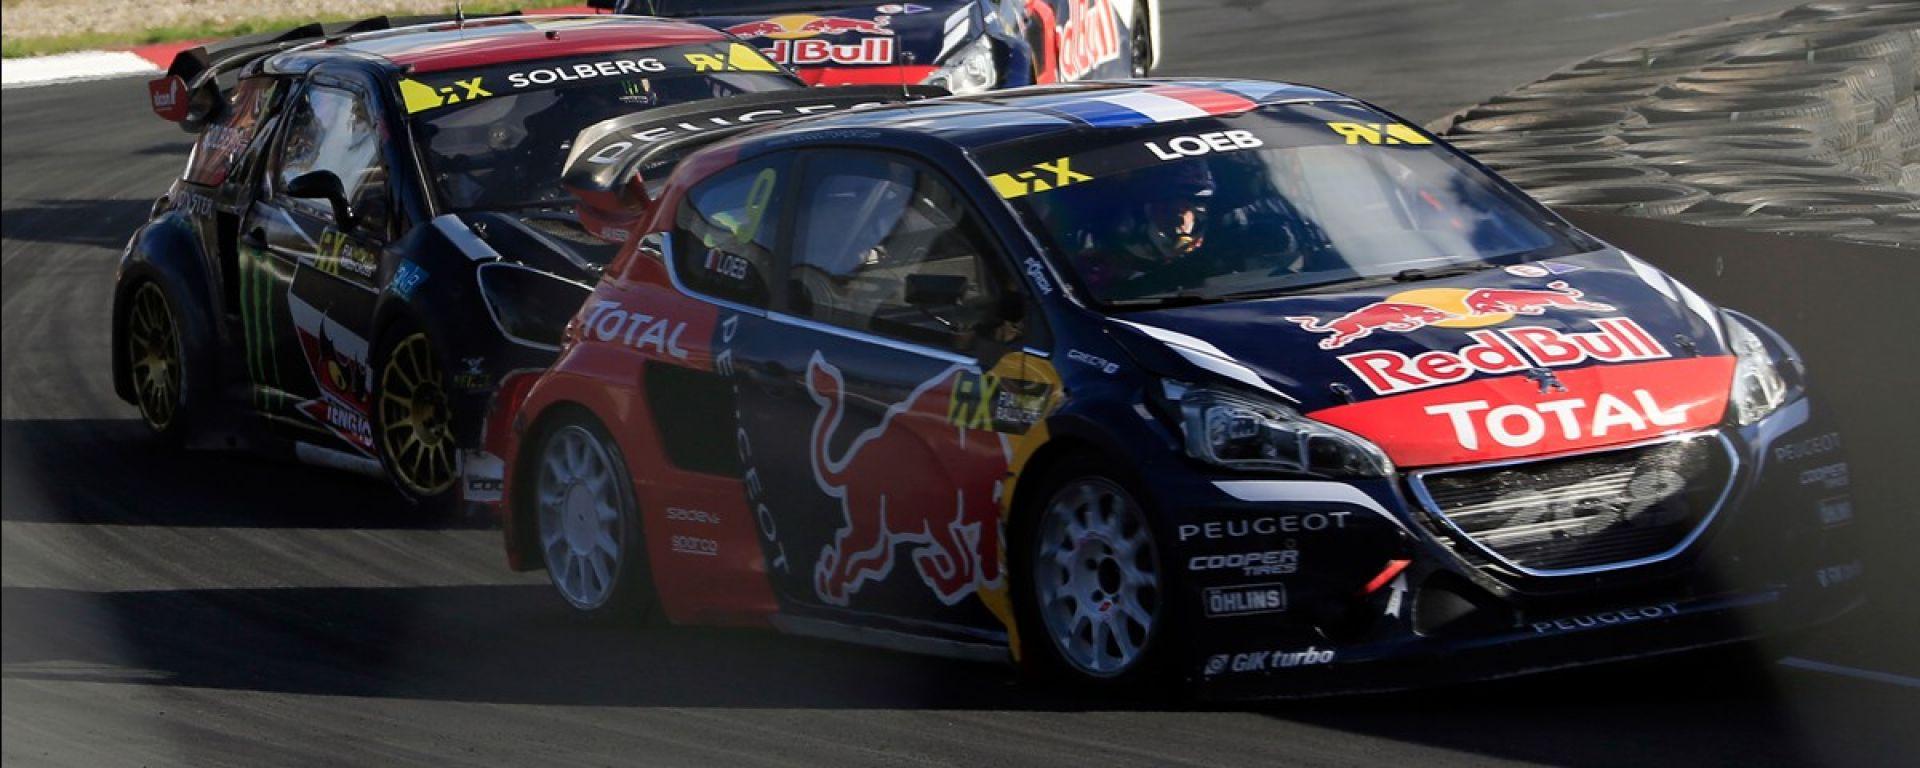 Peugeot Team Hansen - Mondiale Rallycross 2016